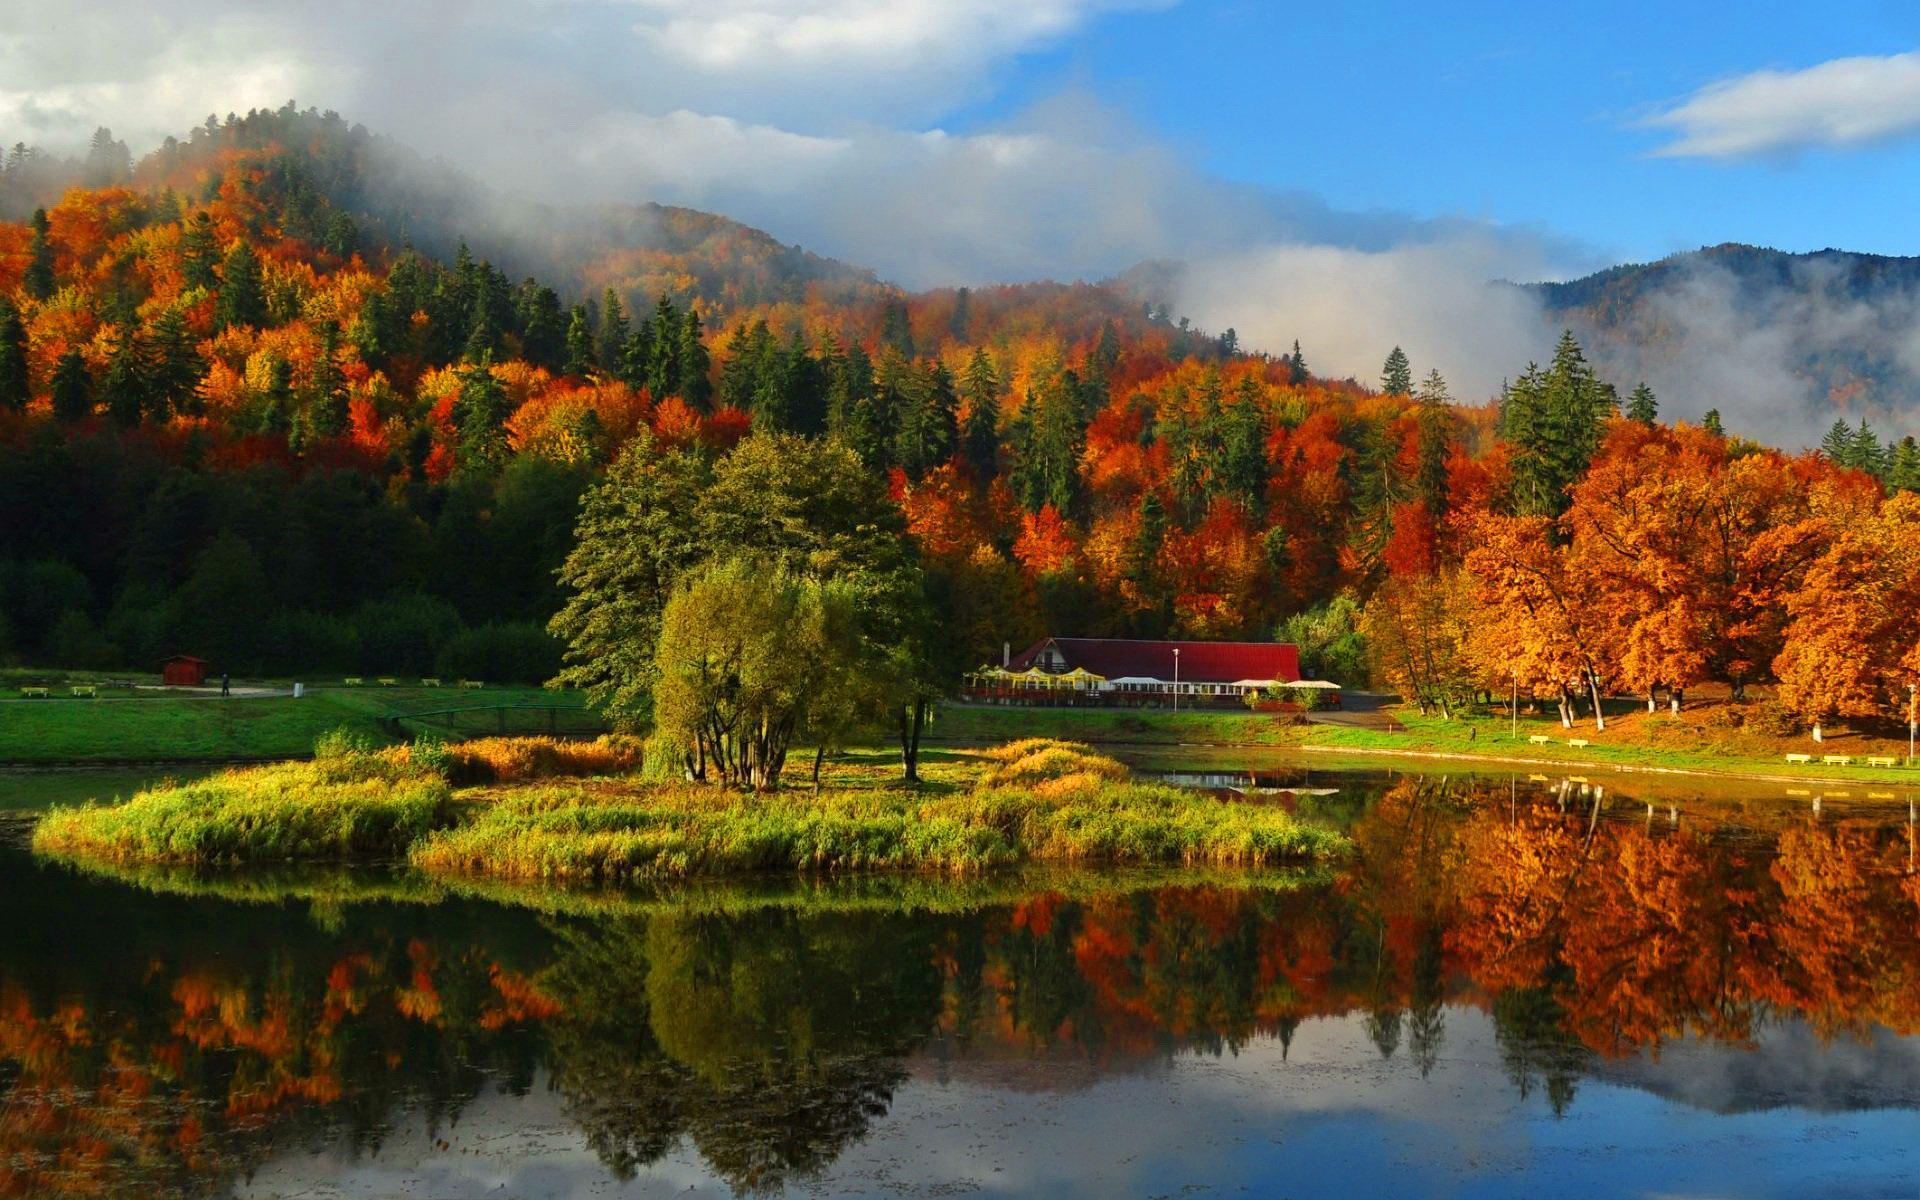 Fall Mountain Wallpapers - Top Free Fall Mountain ...